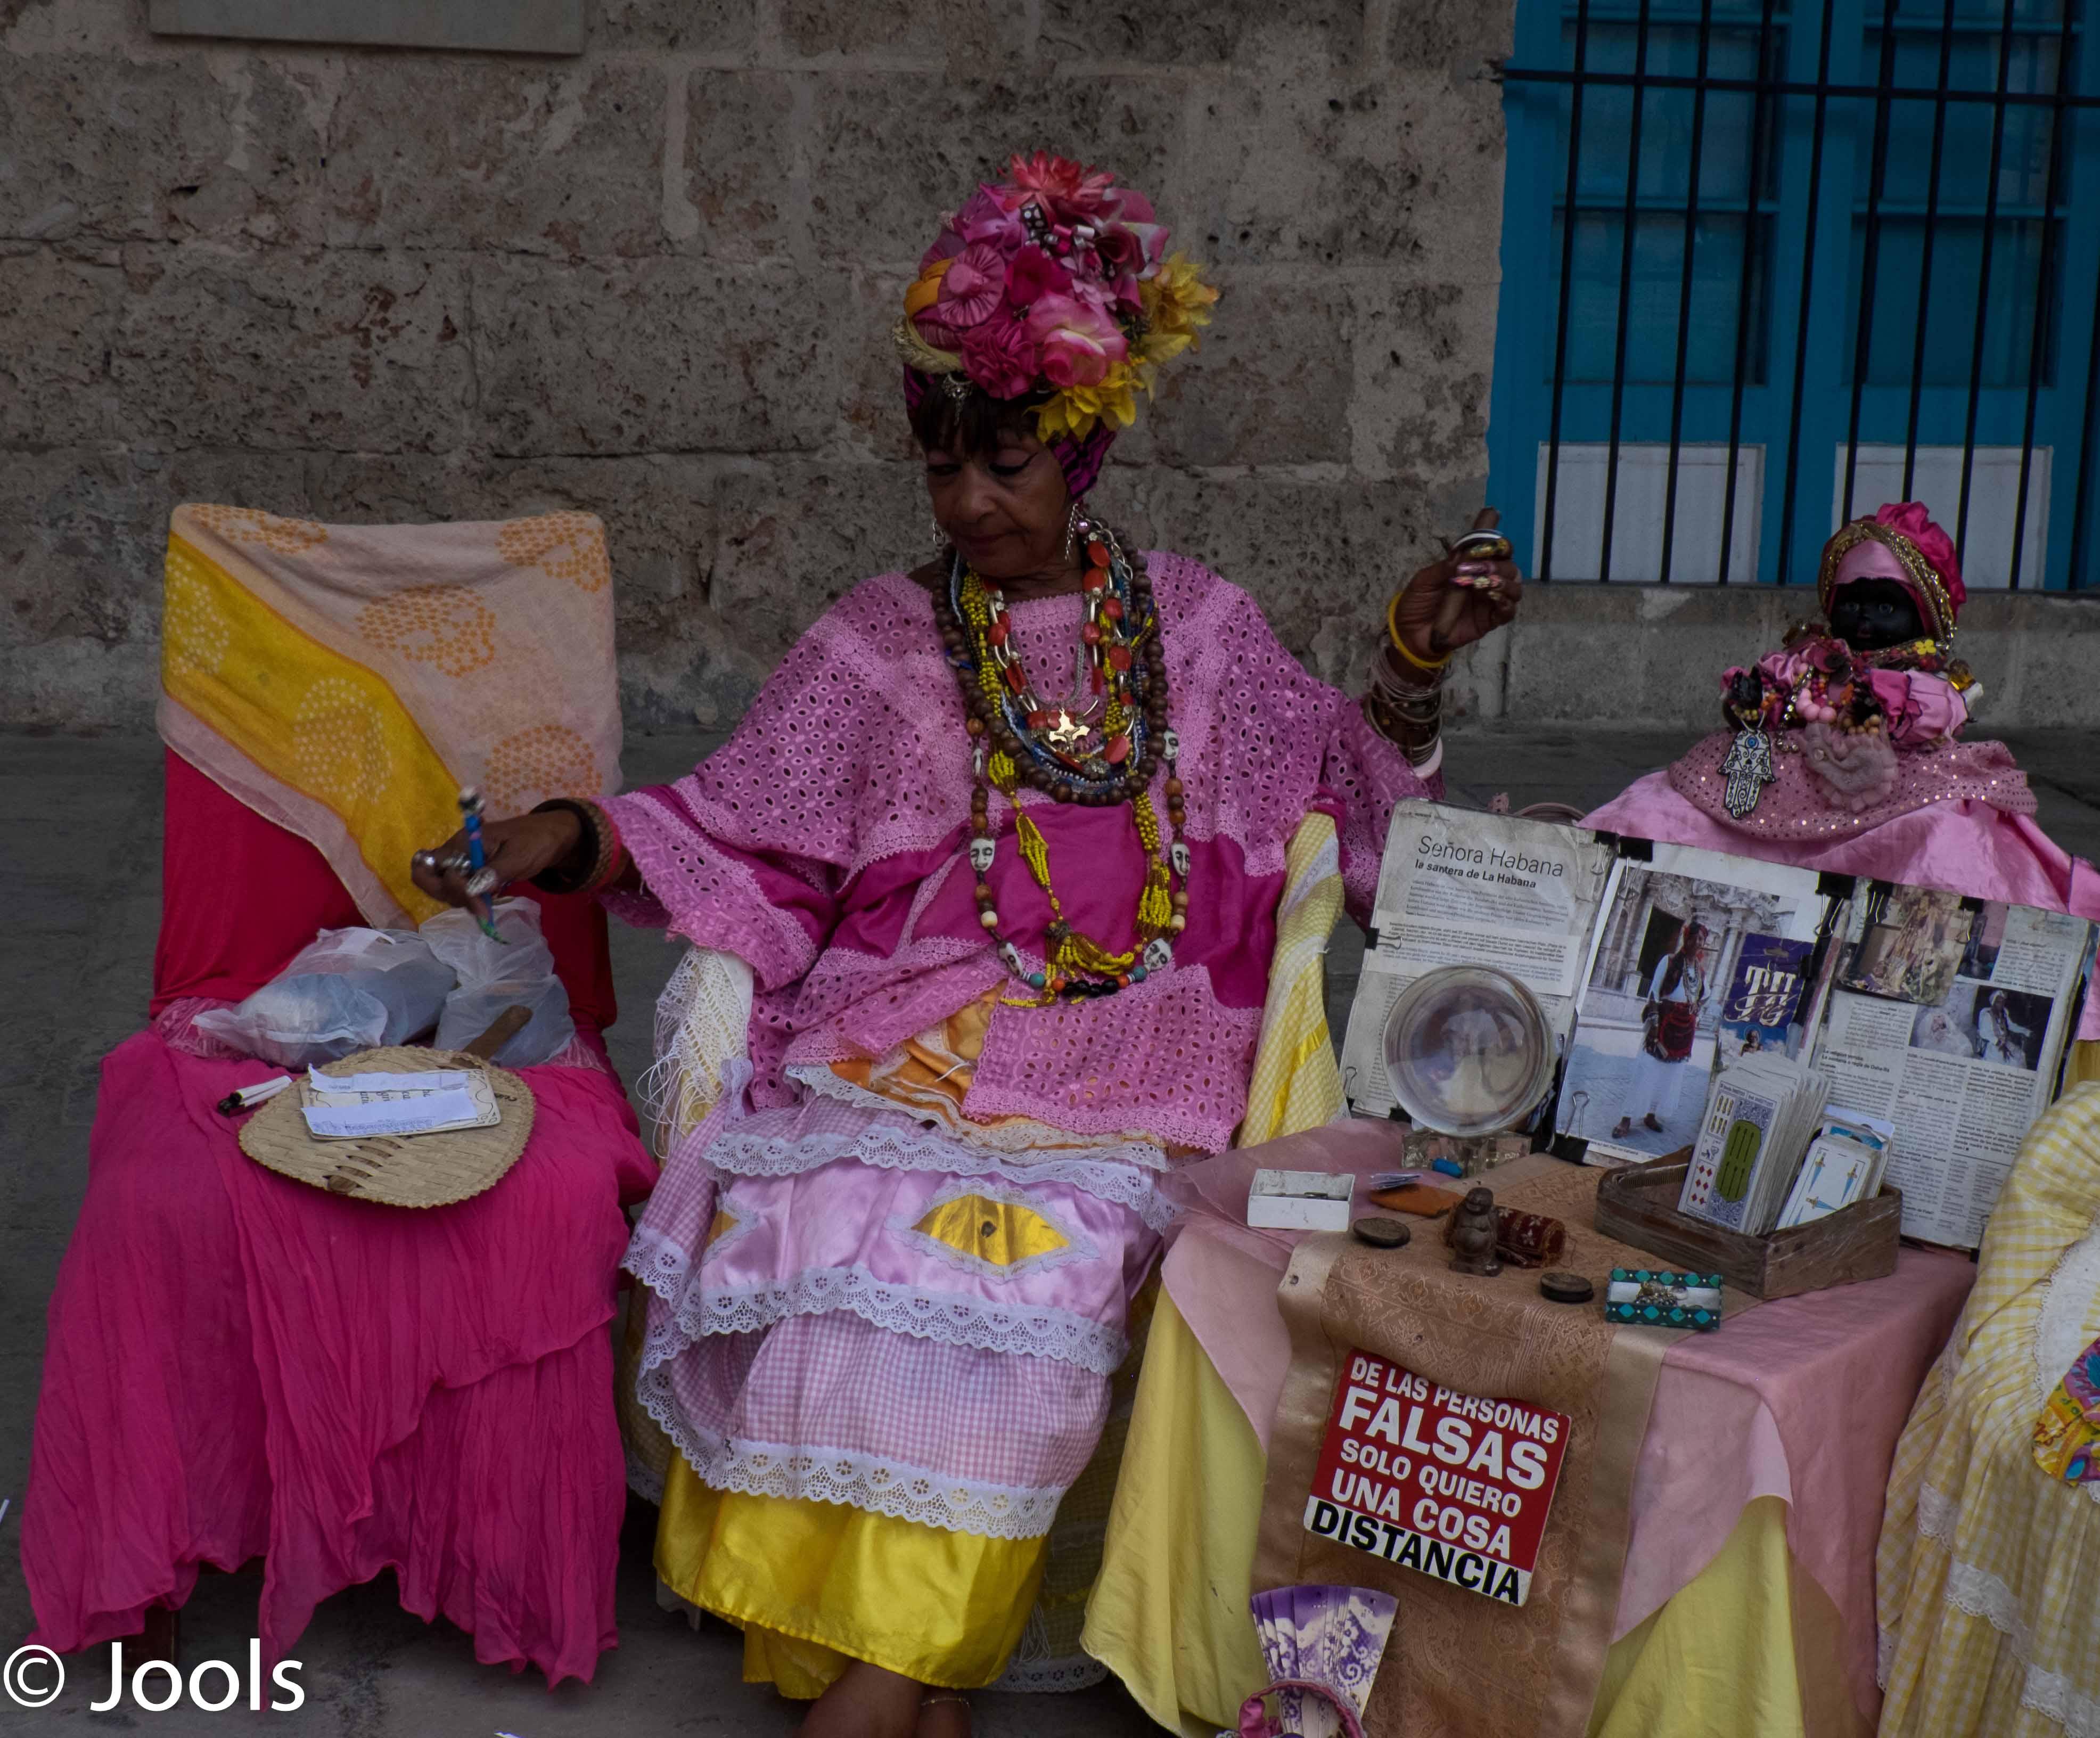 Havana Spotdoll & mistress lowres